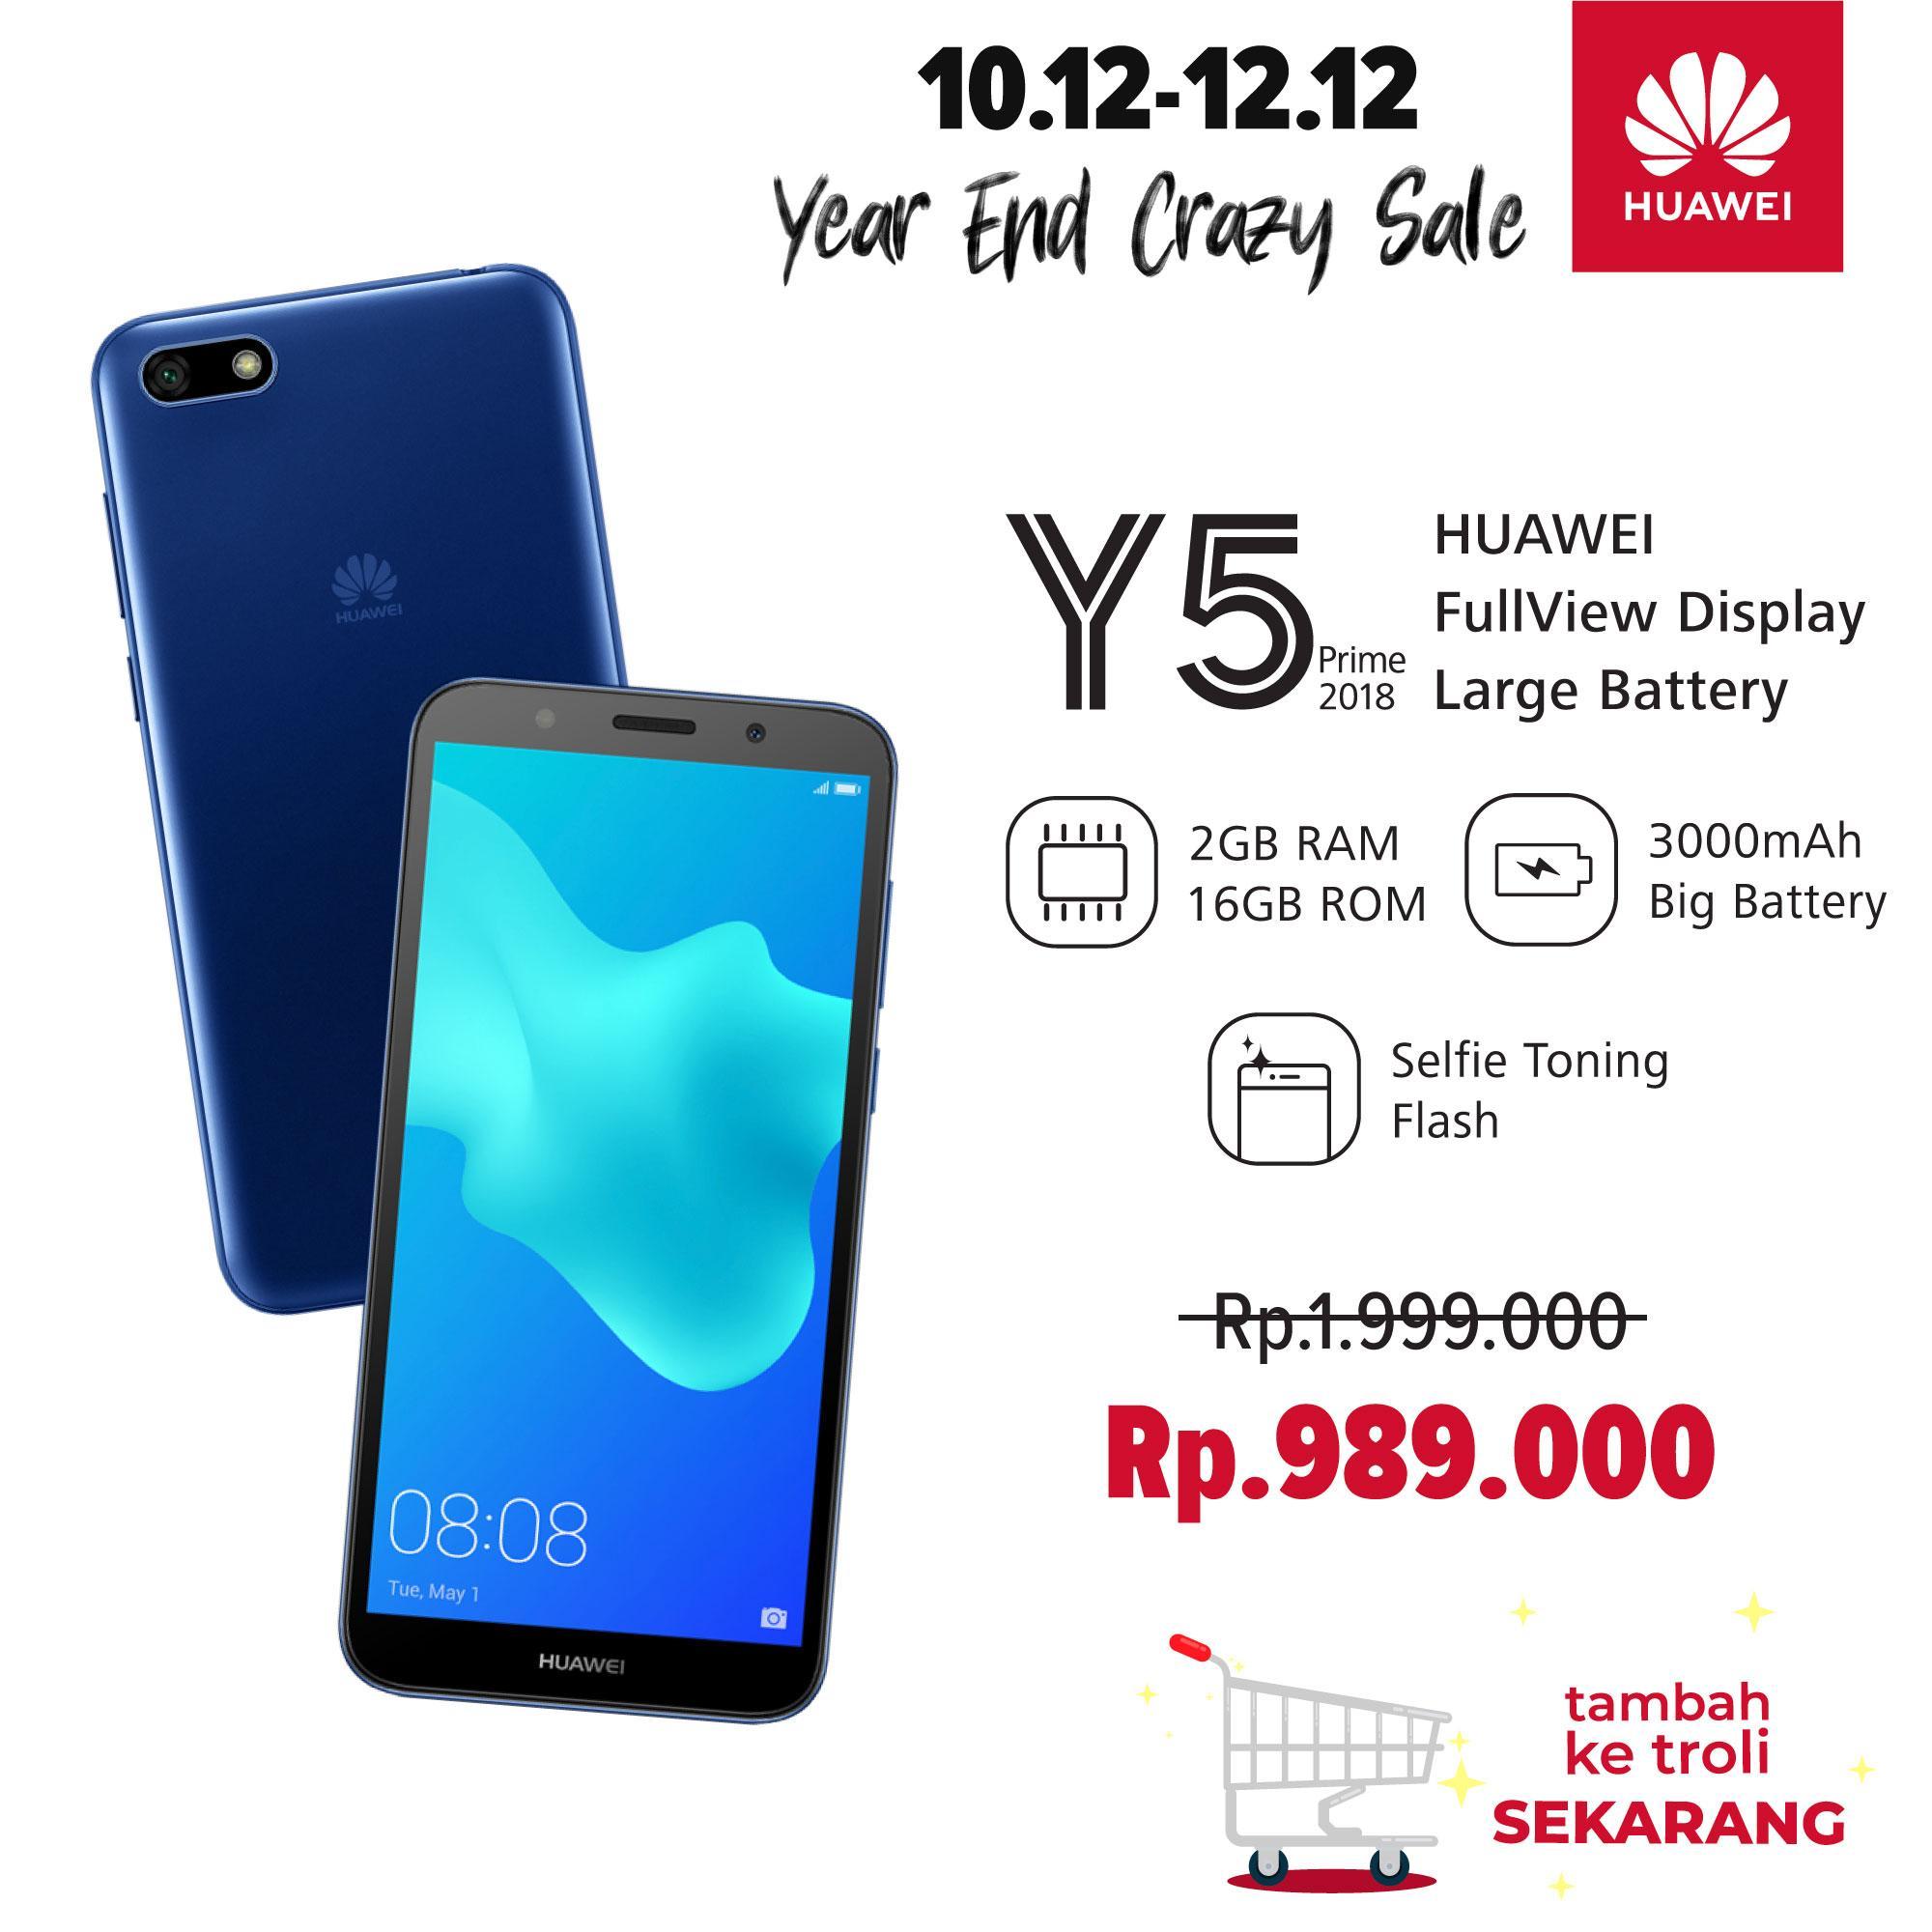 Produk Huawei Terbaru Bergaransi E5575s Modem 4g Mifi Unlock Bundling Telkomsel Black Double 12 Periods 50 Offhuawei Y5 Prime 2018 2gb 16gb